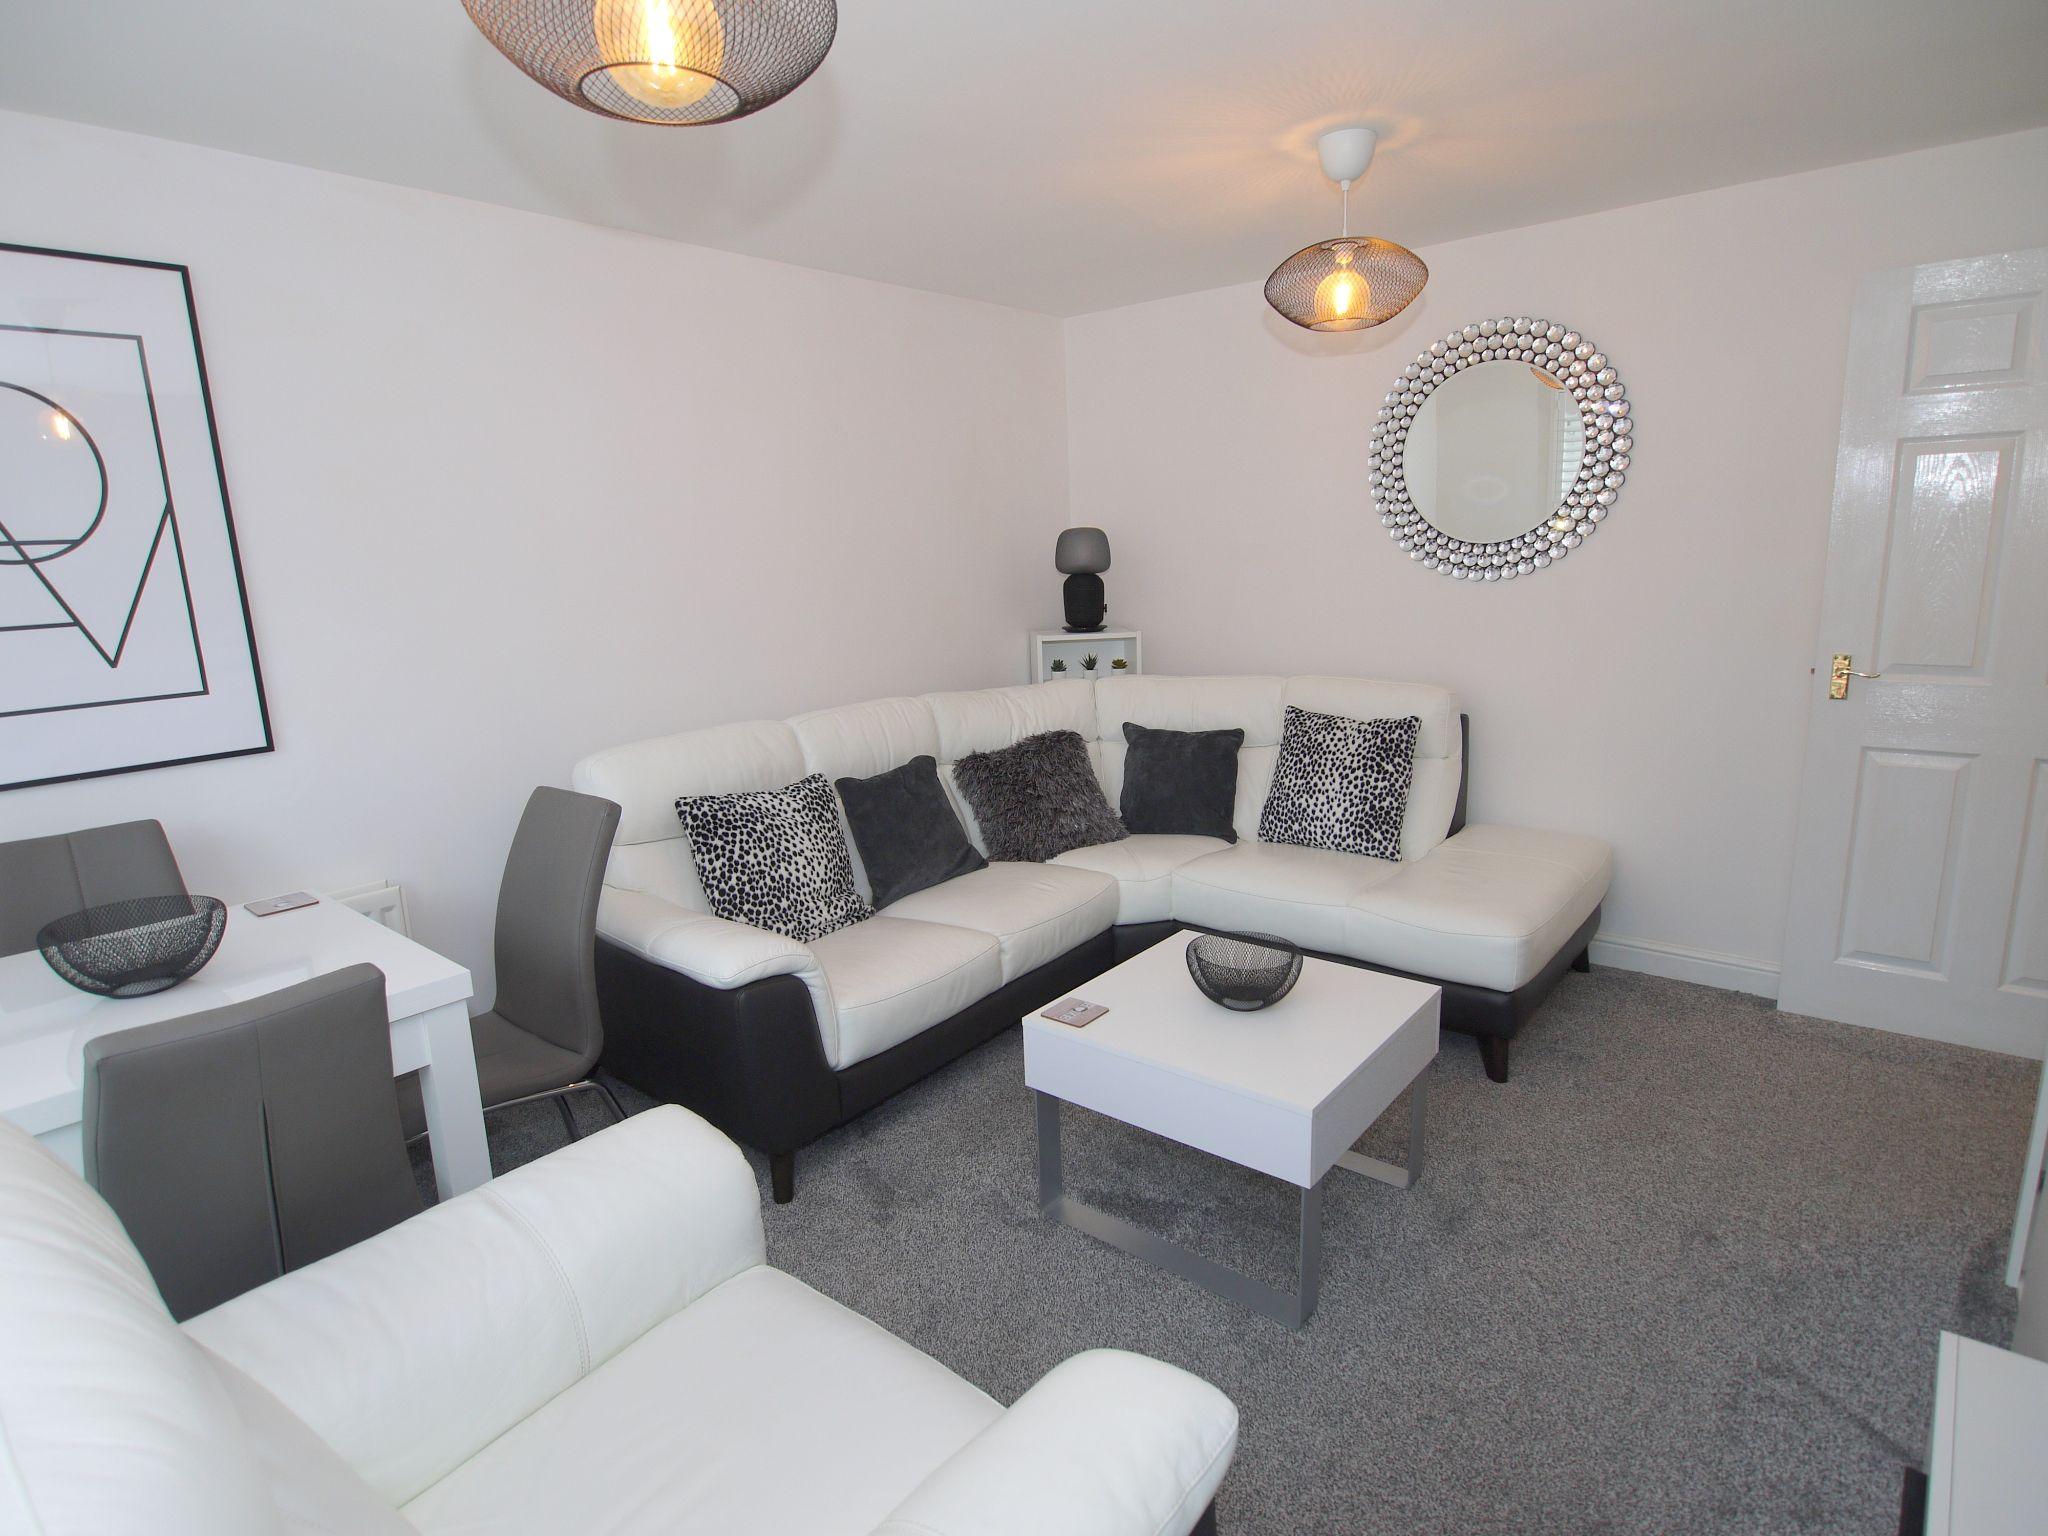 2 bedroom apartment flat/apartment For Sale in Sevenoaks - Photograph 3